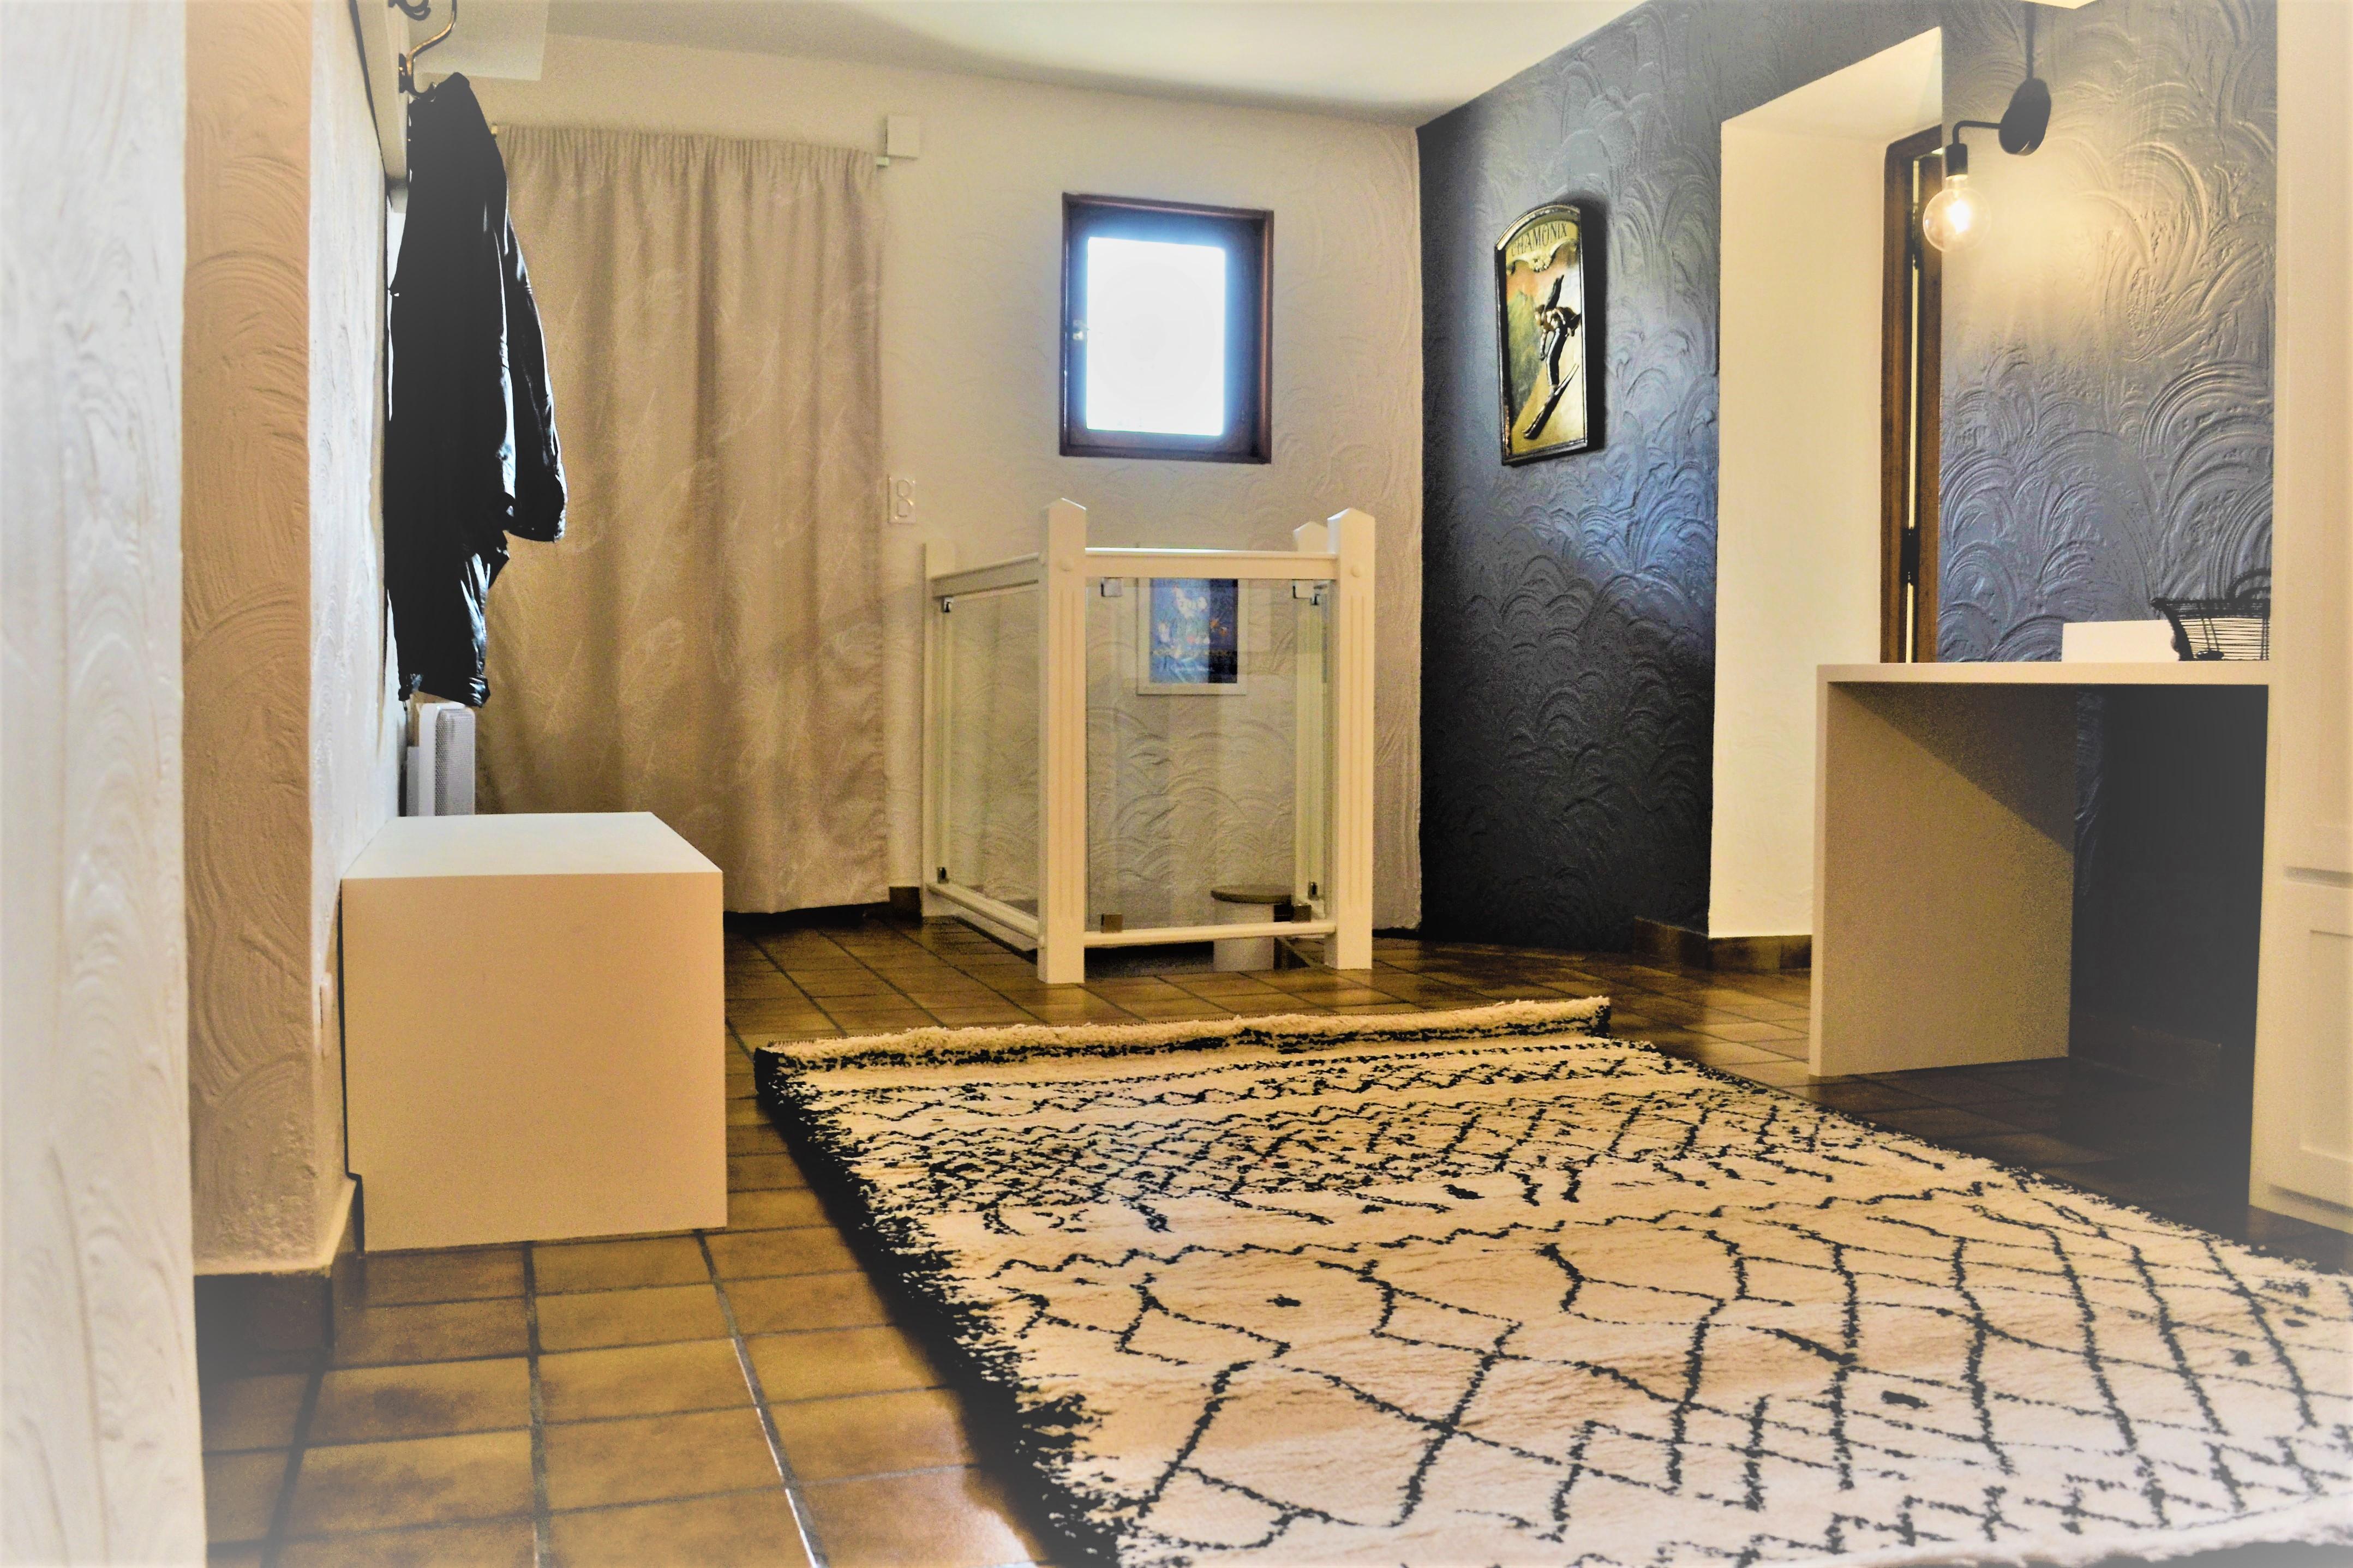 la premi re impression marignier janvier 2018 aura. Black Bedroom Furniture Sets. Home Design Ideas